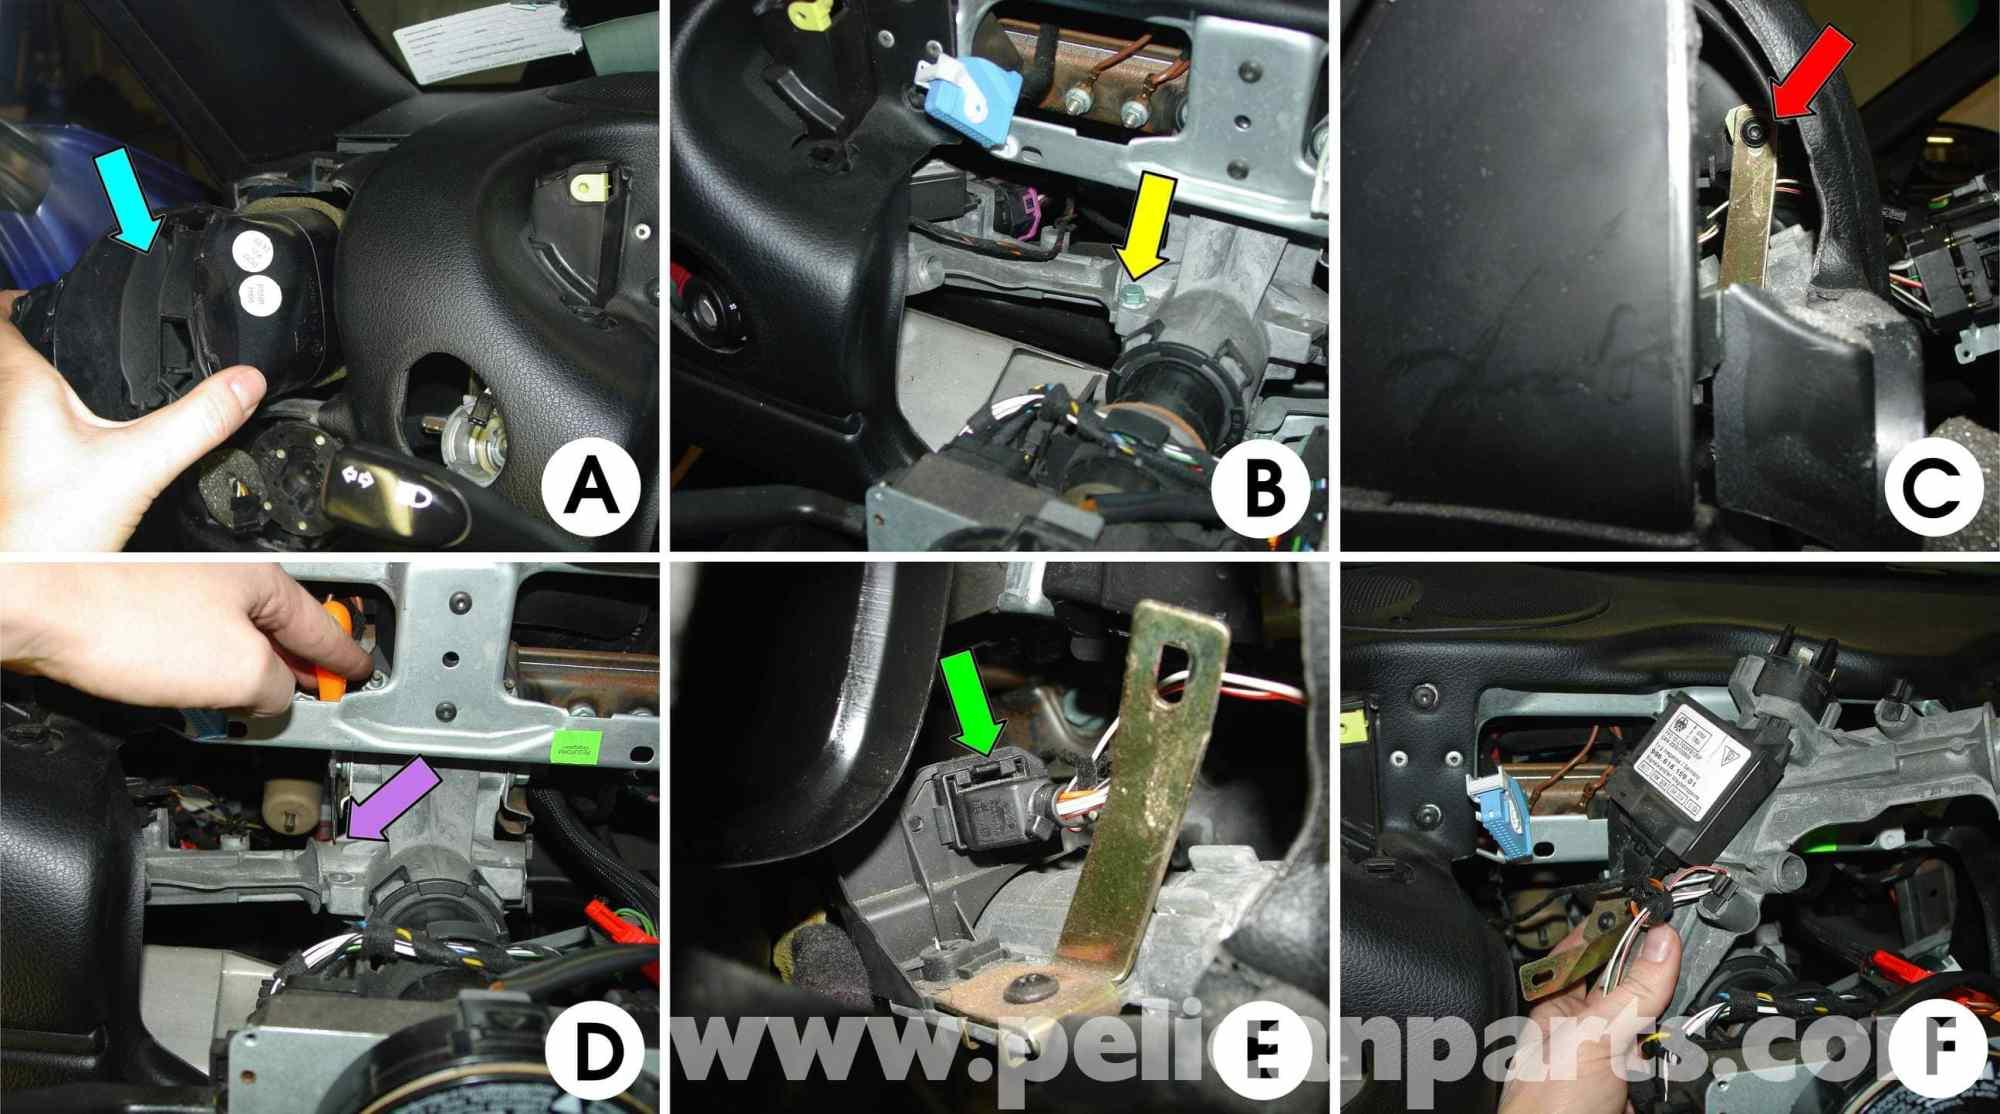 hight resolution of 2007 saab 9 3 steering lock diagram wiring diagram dat 2007 saab 9 3 steering lock diagram